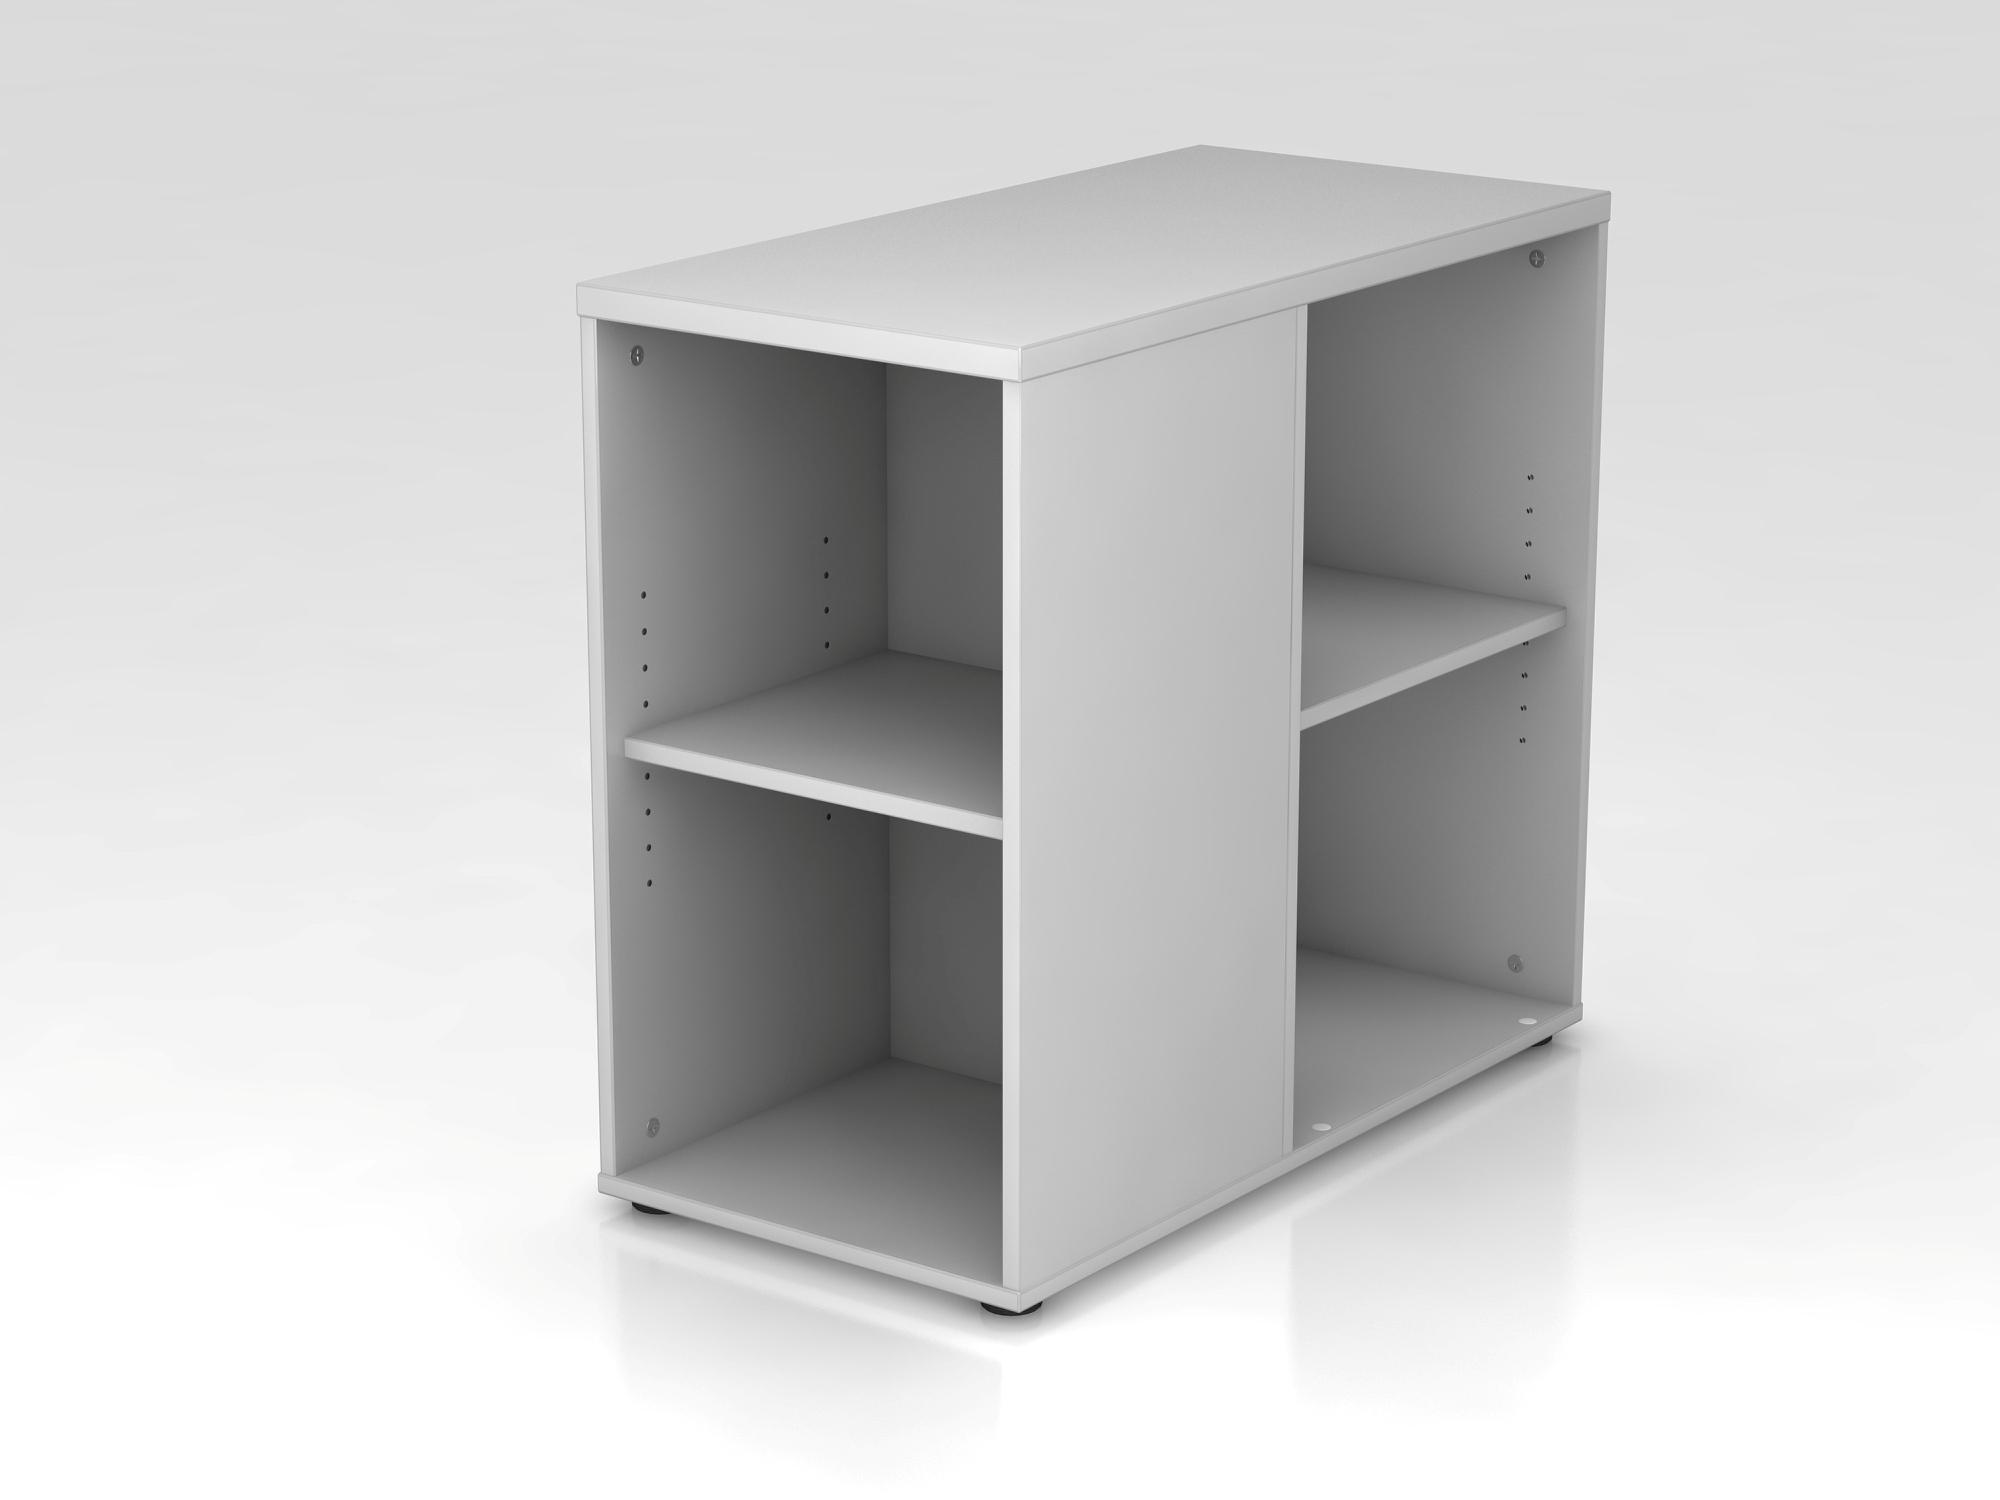 Anstellcontainer Grau